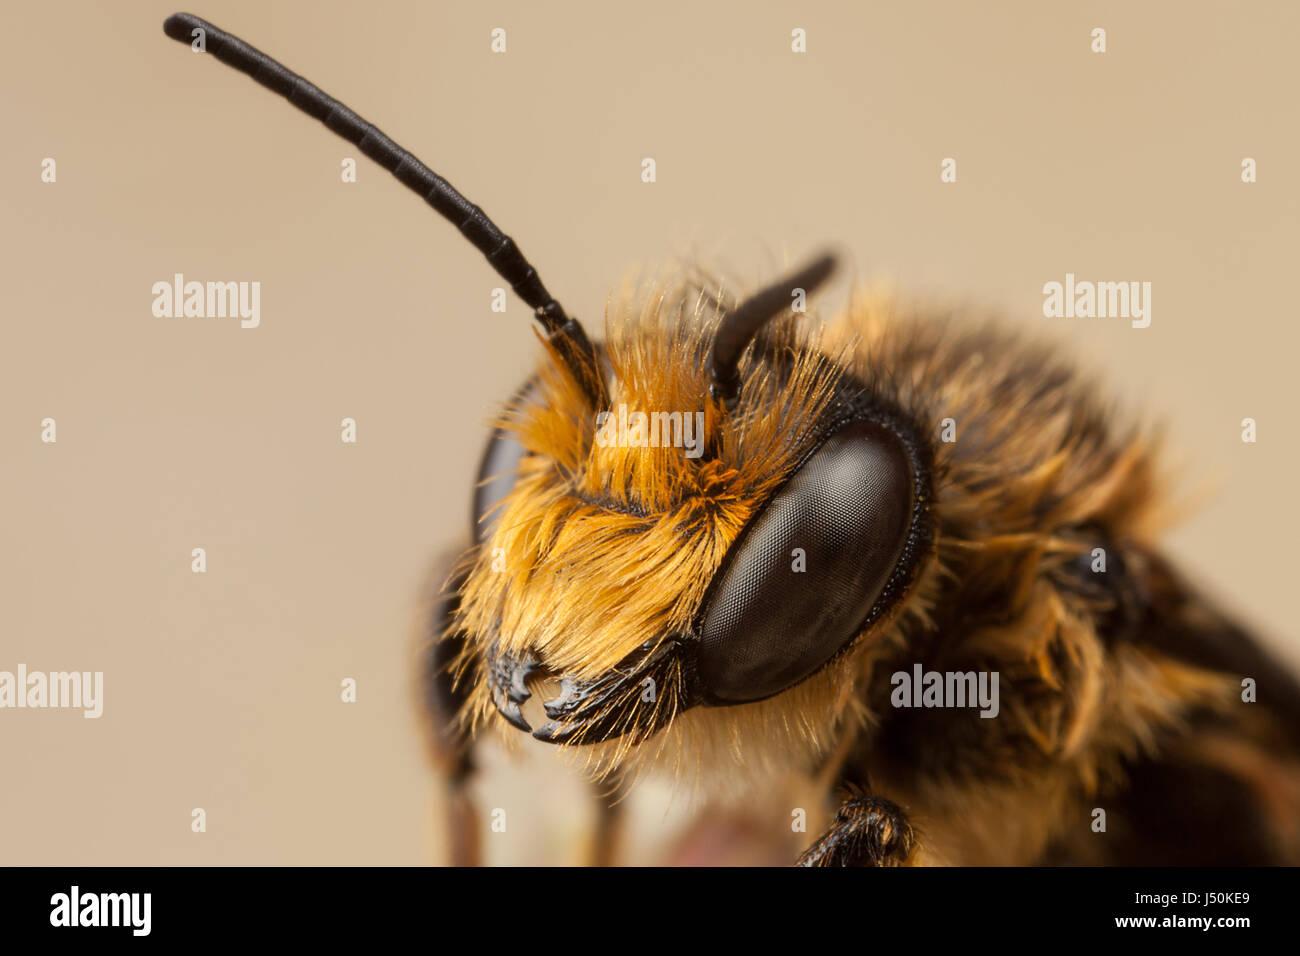 Rote Mauerbiene, Osmia bicornis Stockbild